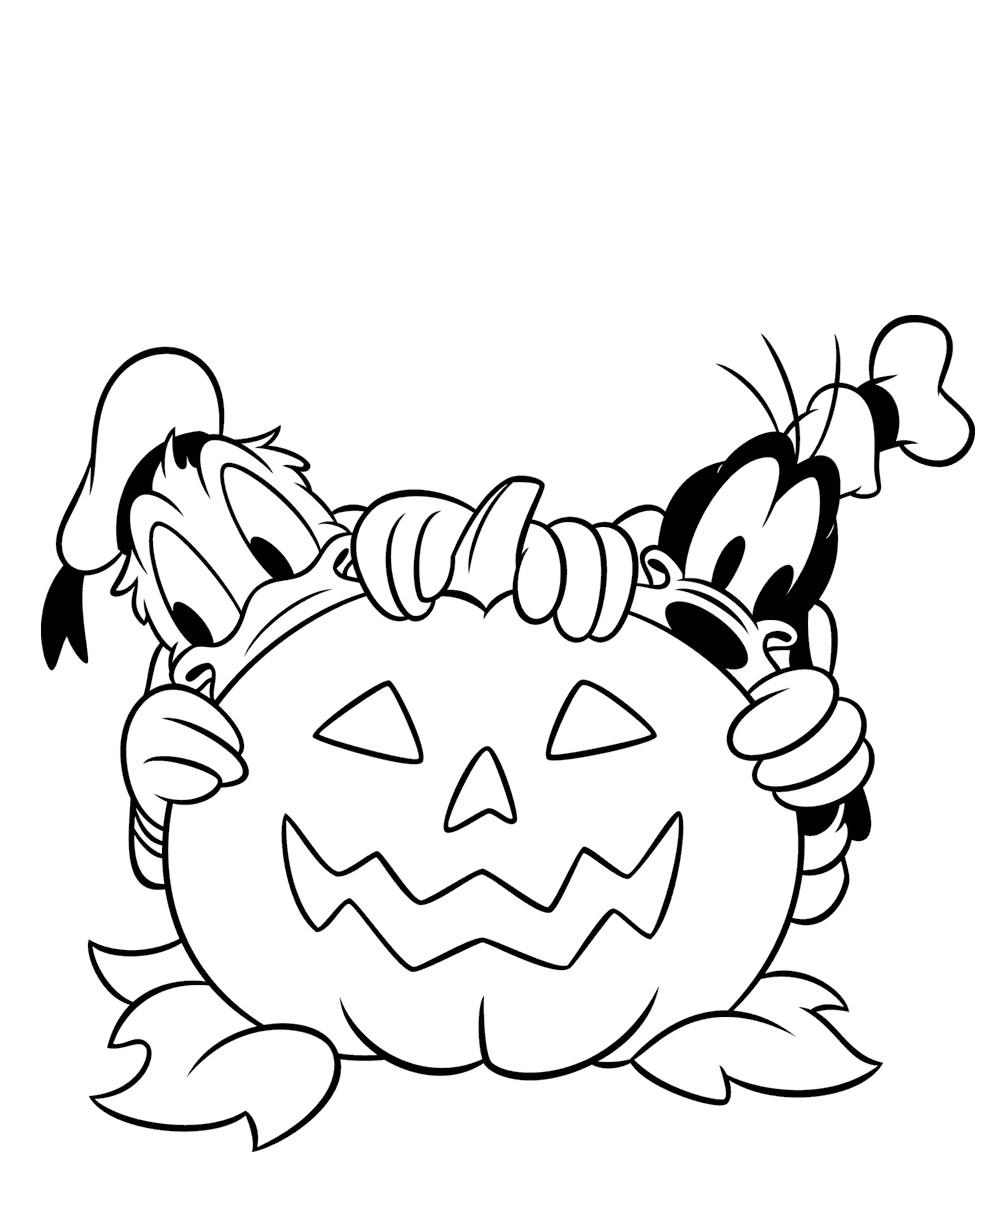 Coloriage donald et pluto halloween imprimer - Dessin de mickey a colorier ...